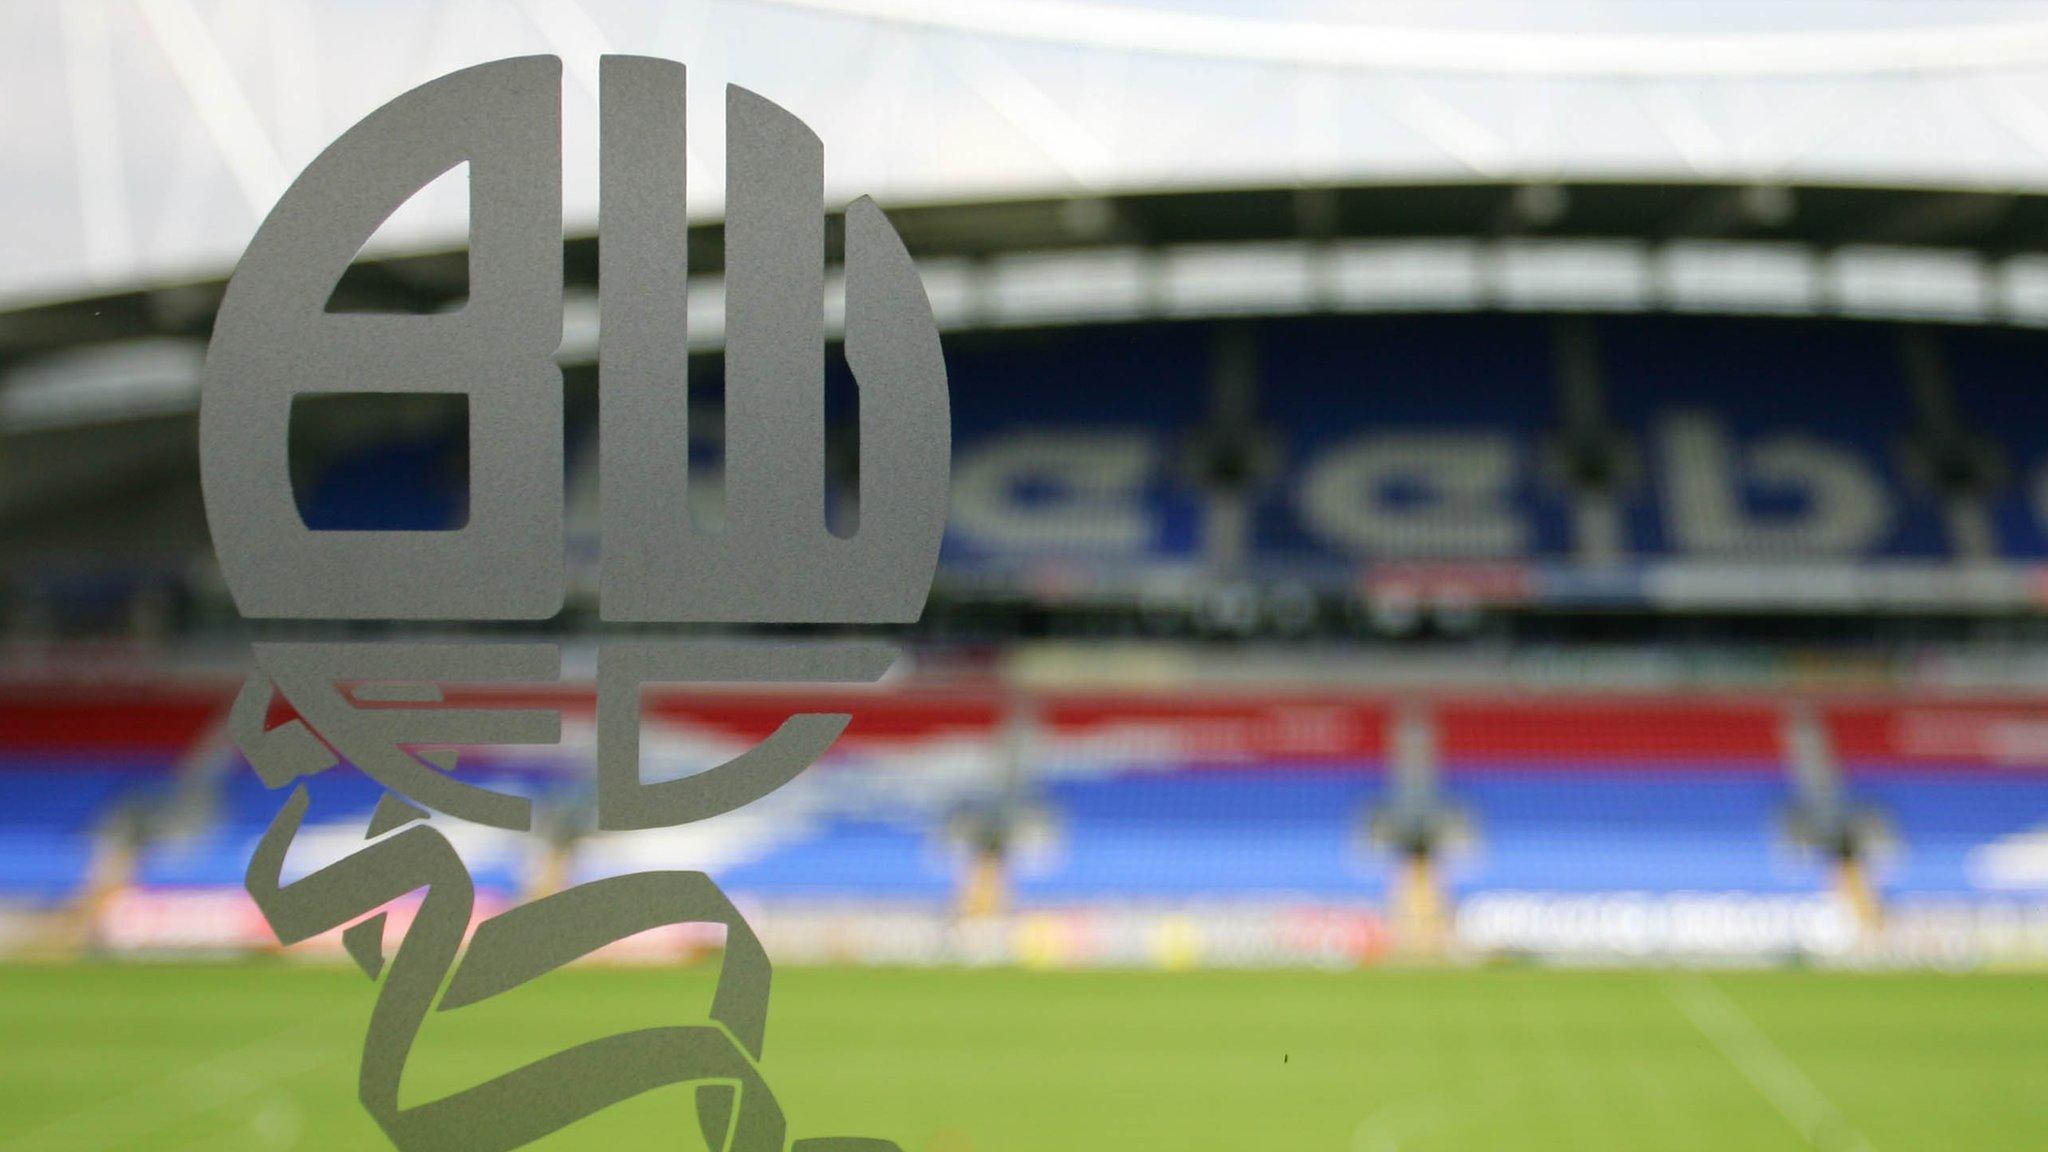 Bolton Wanderers: High Court hearing over £1.2m unpaid tax bill adjourned